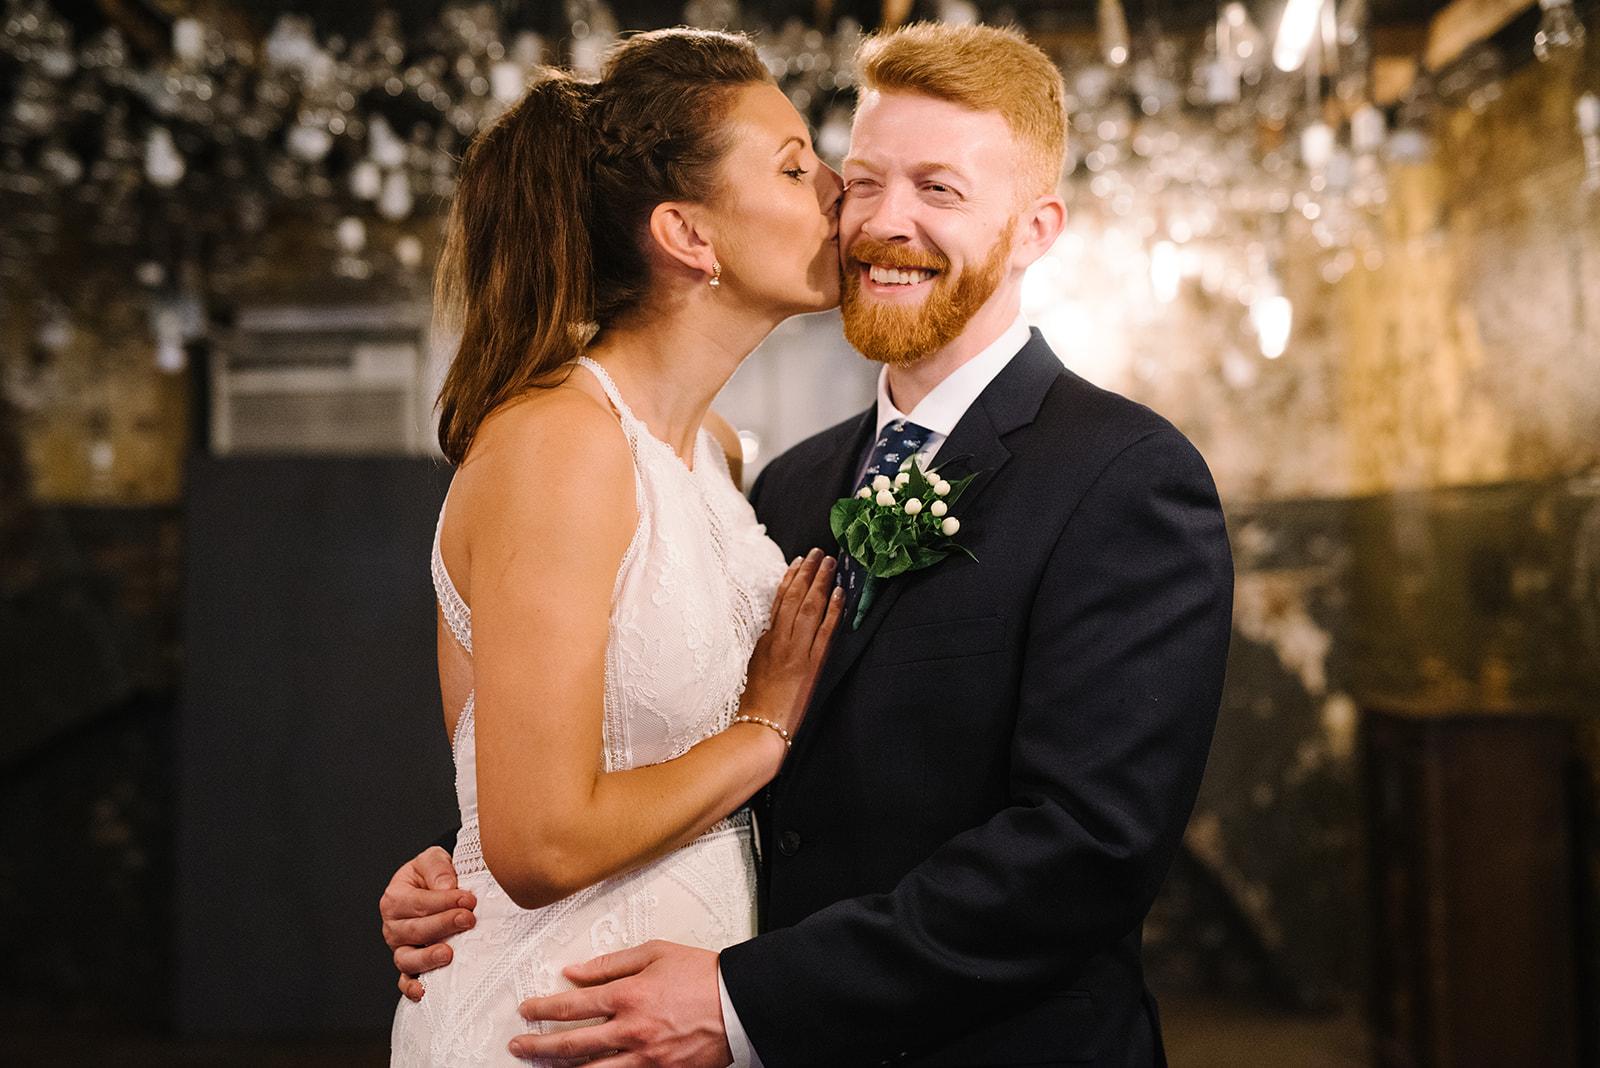 Art Factory Wedding- Industrial Chic- Audrey+Ryan- Paterson NJ- Olivia Christina Photo (22).jpg